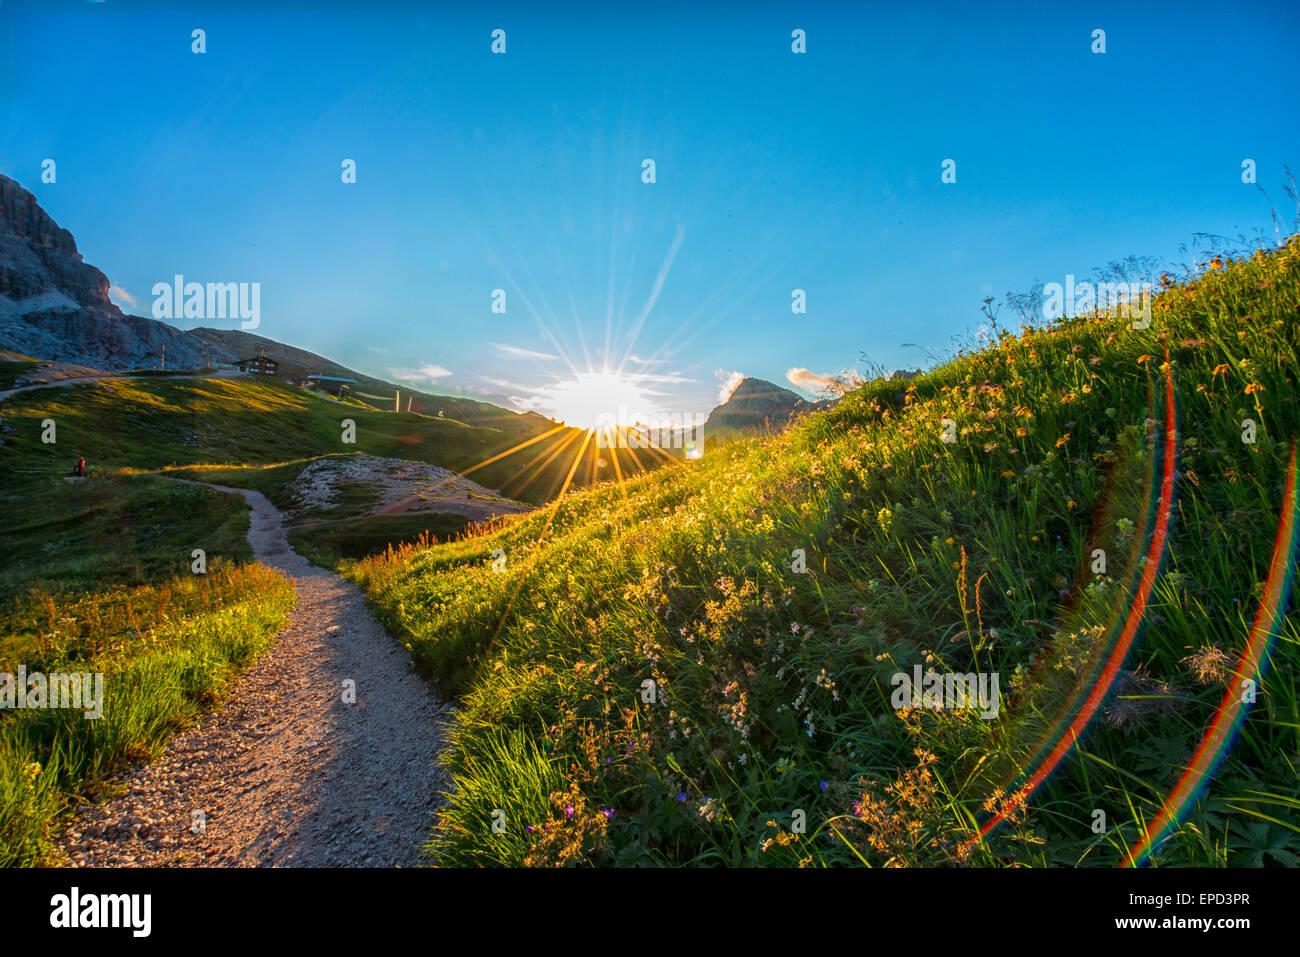 Sunset on Dolomites, trekking path, Cinque Torri area, Dolomites, Italy - Stock Image